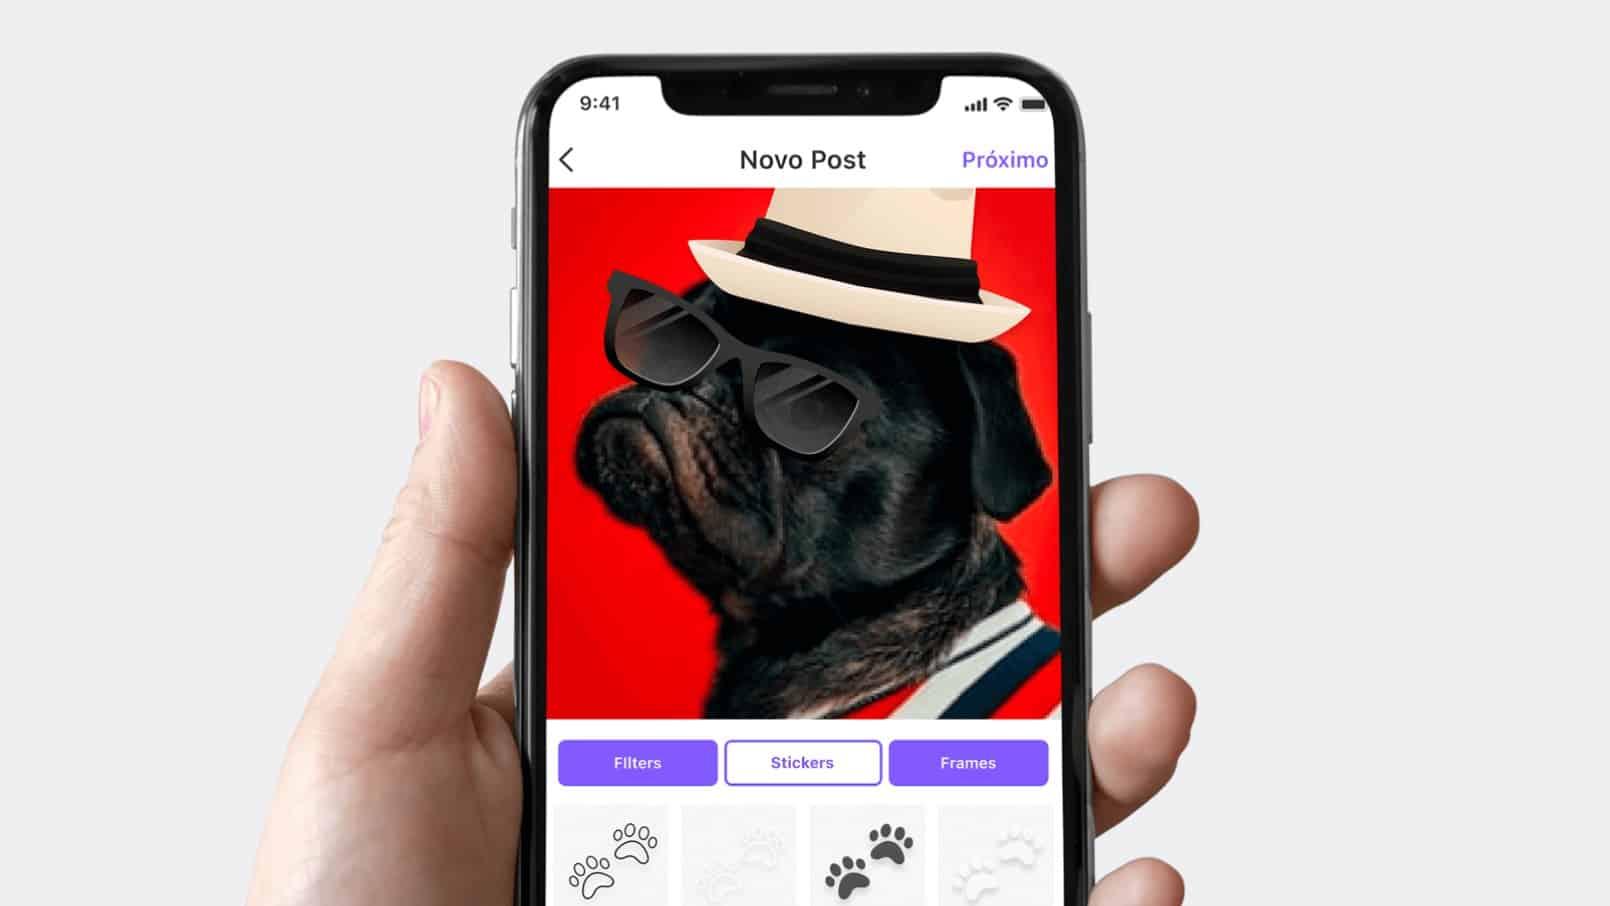 Empresa brasileira desenvolve app internacional focado no universo pet